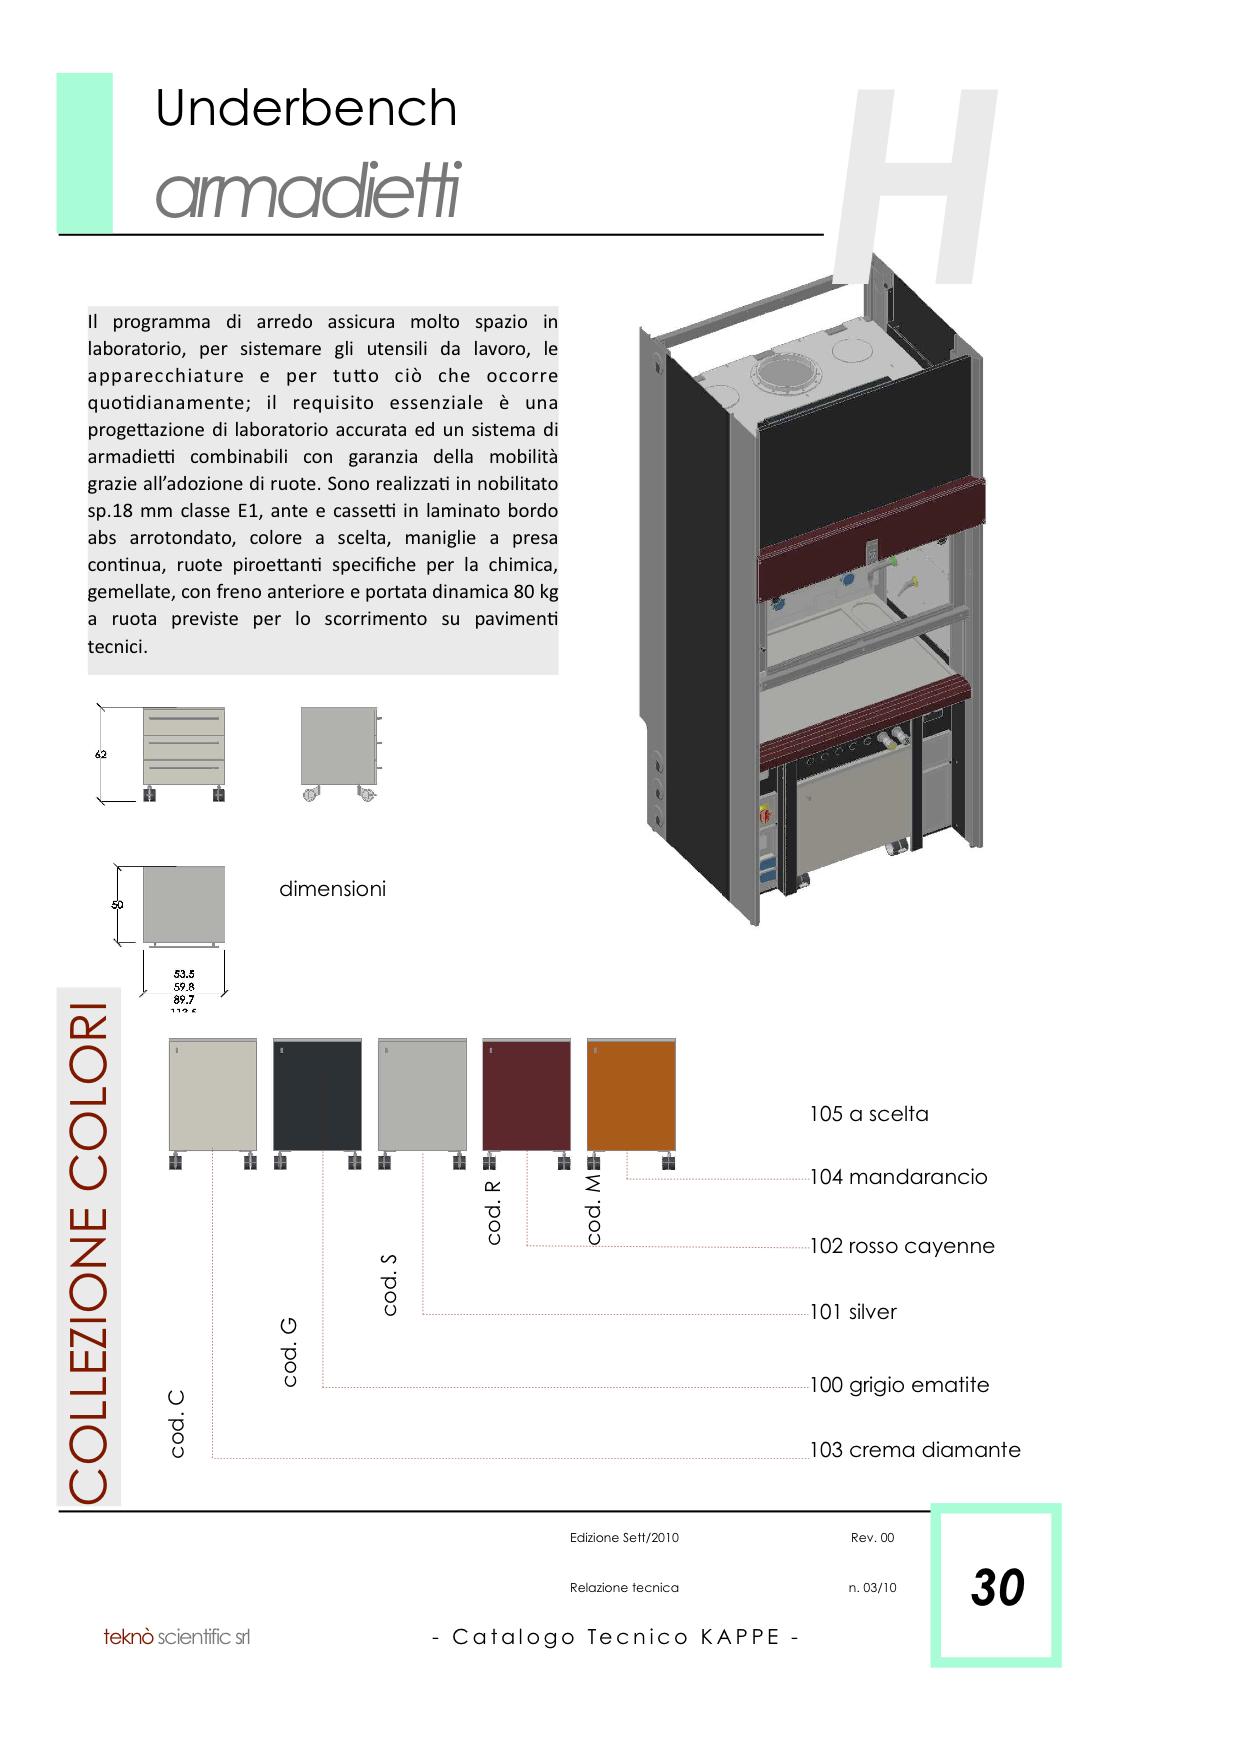 KAPPE Catalogo Tecnico Generale copia 9.png